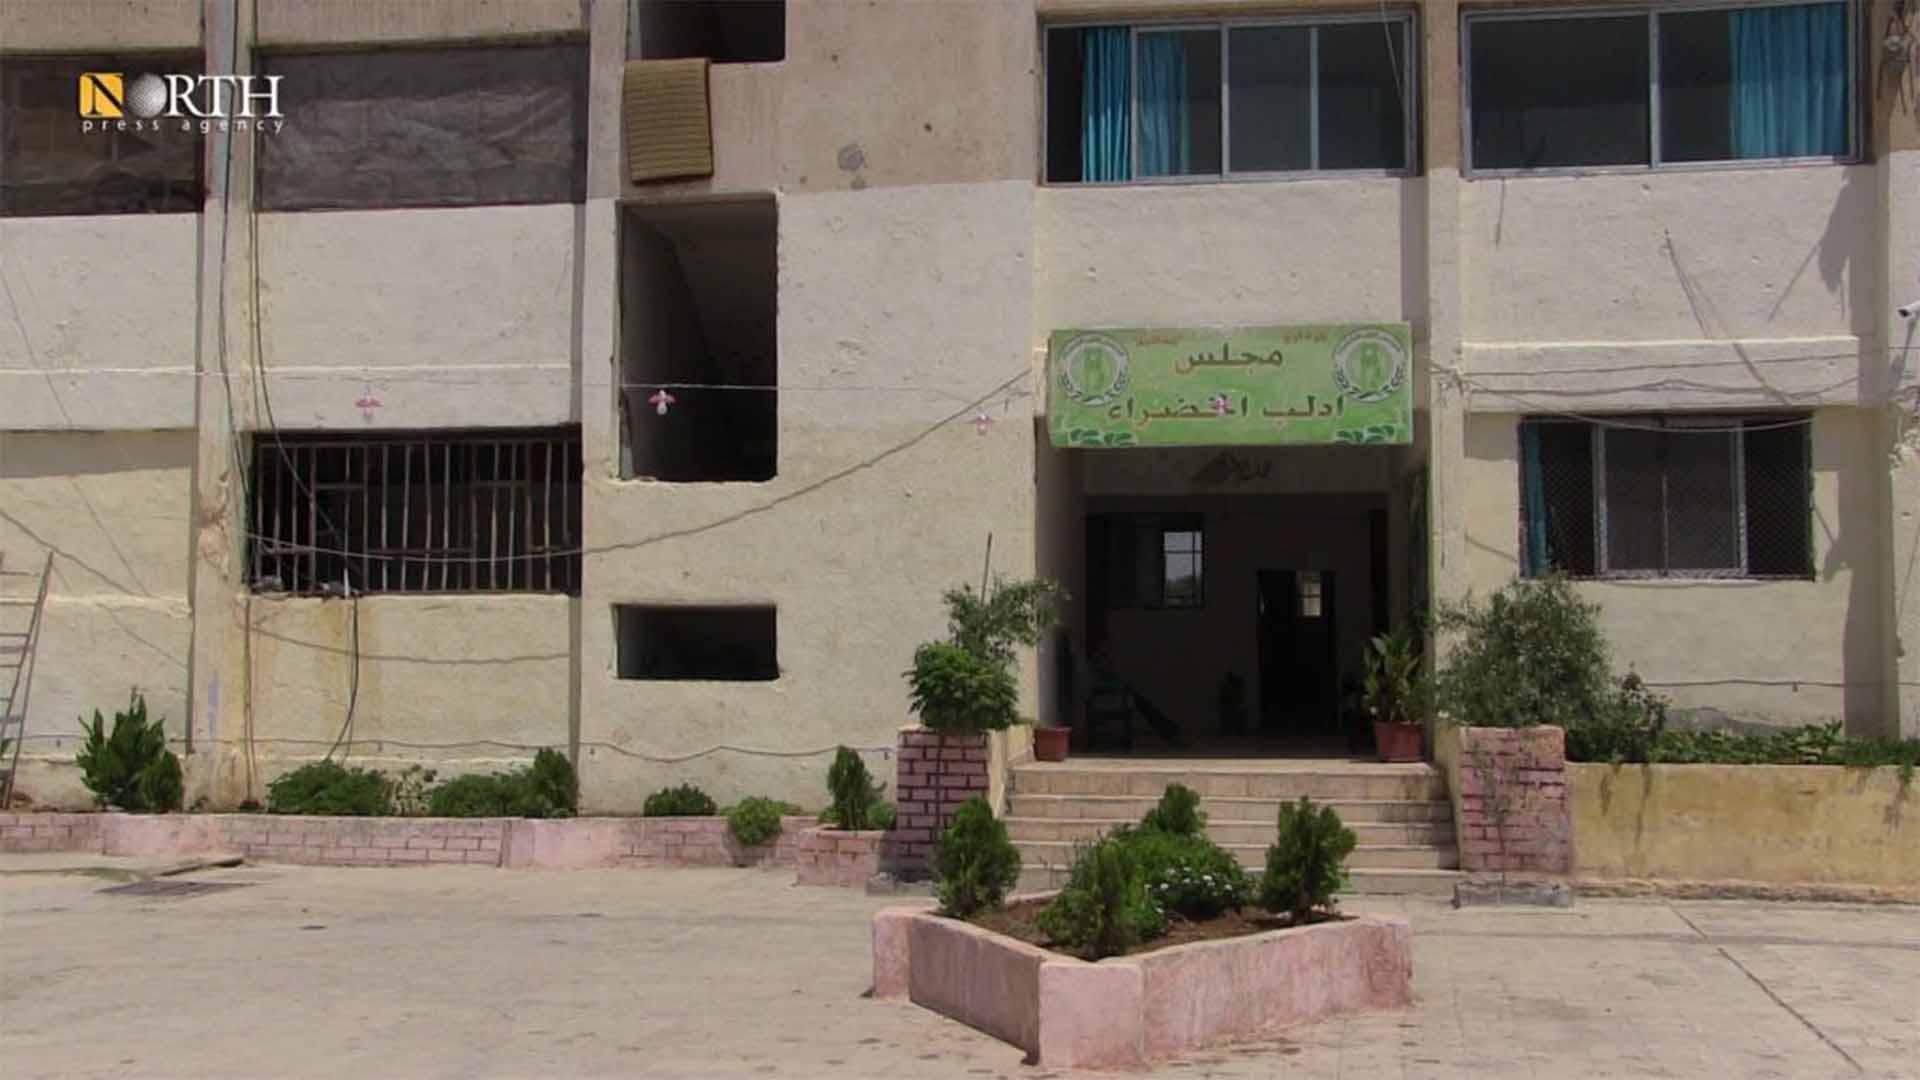 Green Idlib Council in the city of Raqqa – North Press.